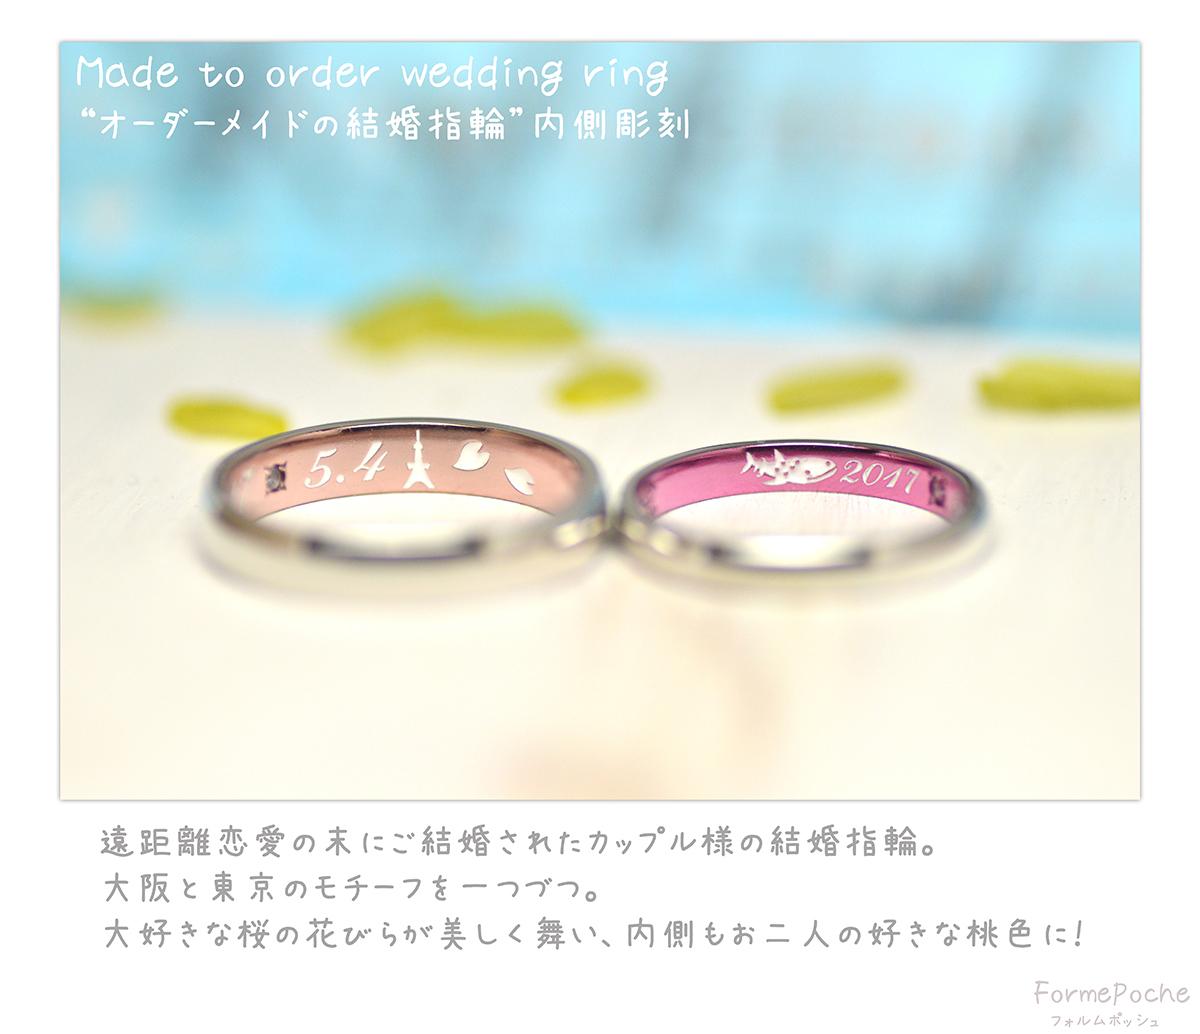 hi180614w1154-ring2 オリジナルの結婚指輪 ピンク 大阪 東京 刻印